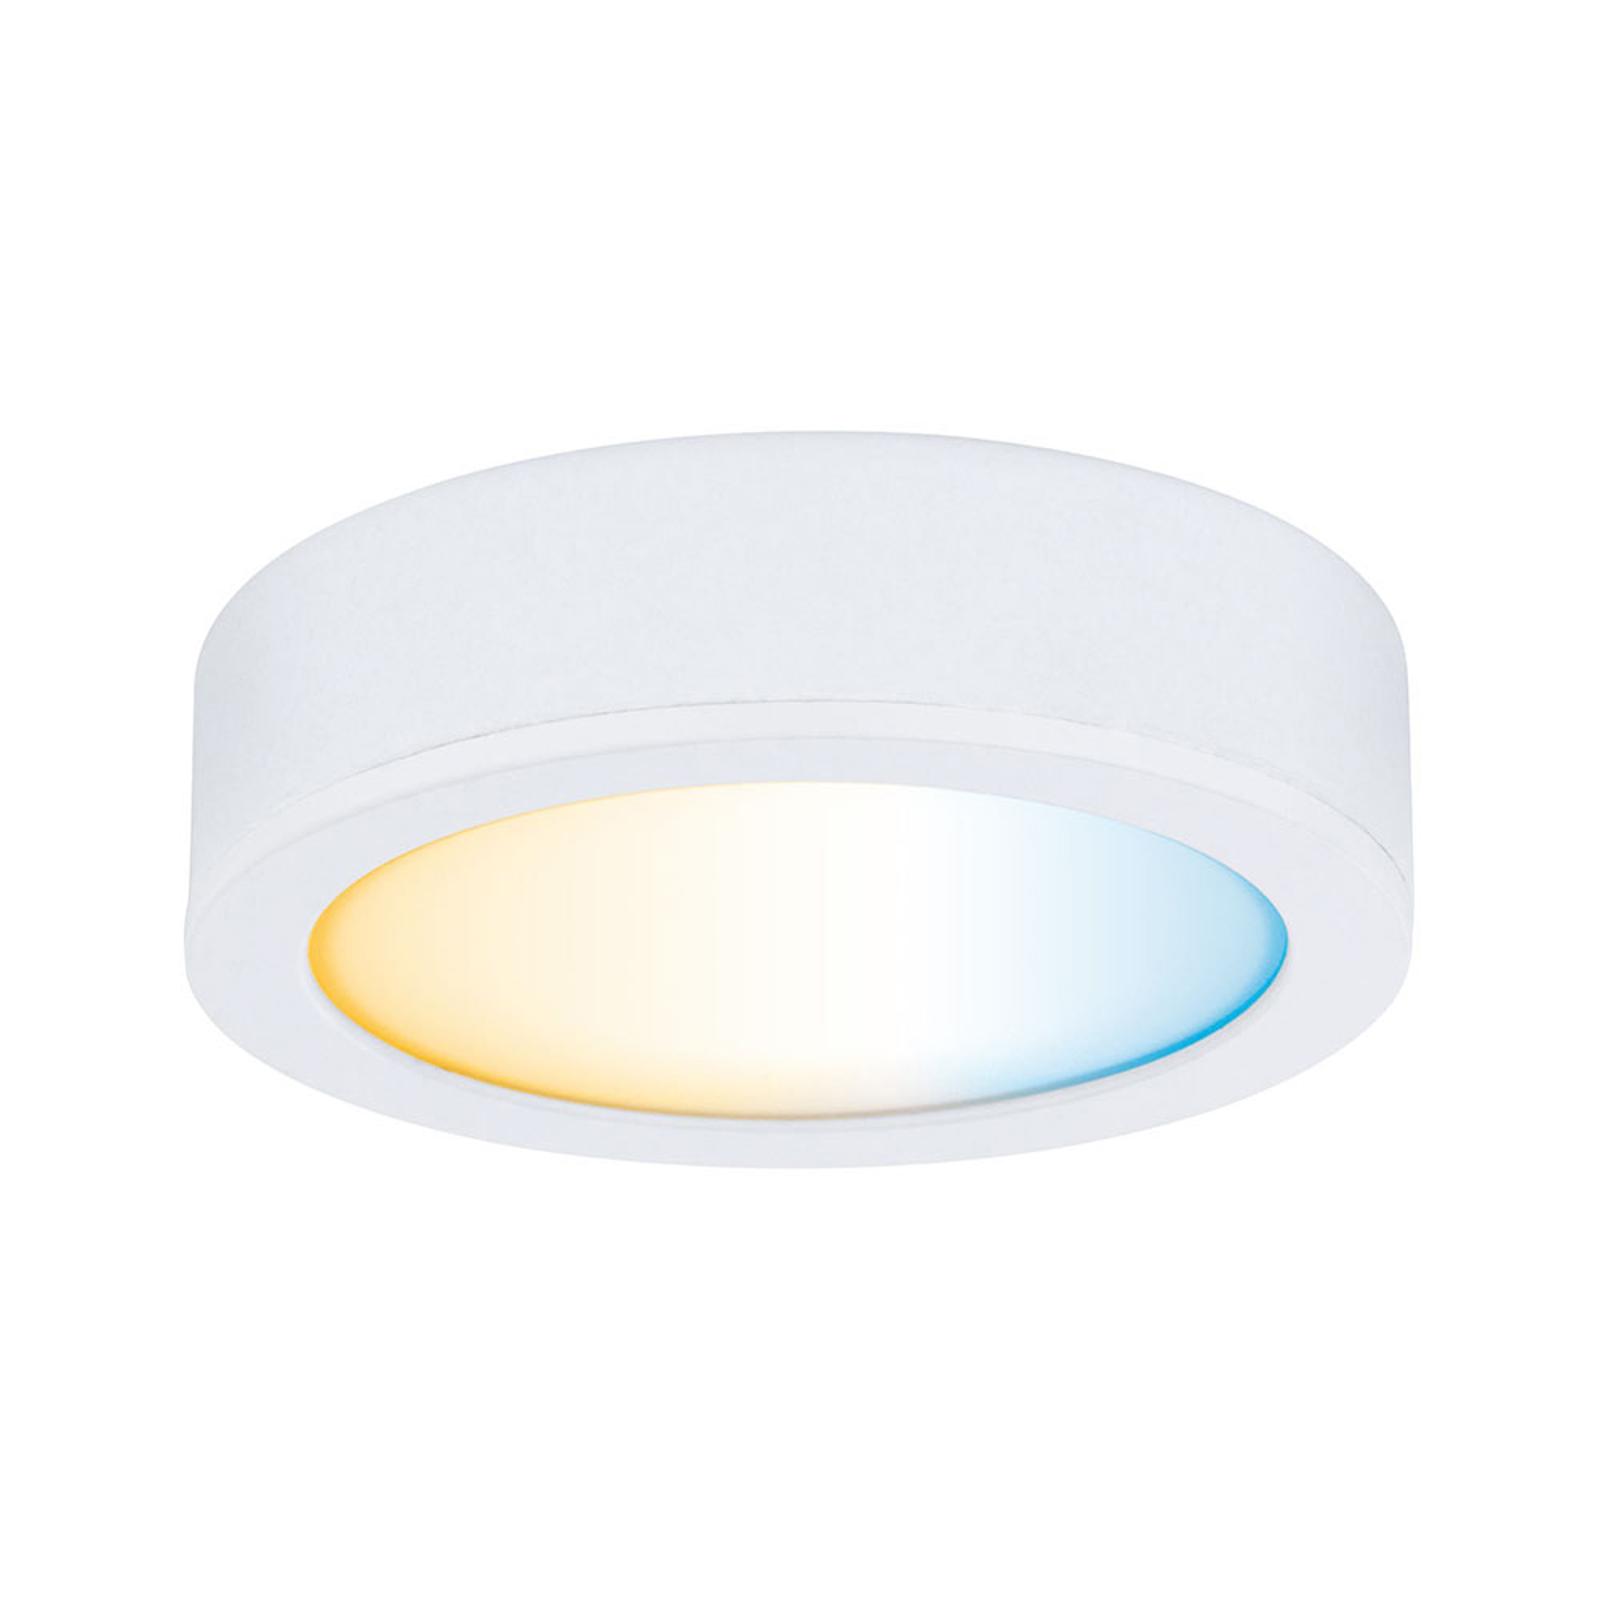 Paulmann Clever Connect Disc lampa do mebli, biała